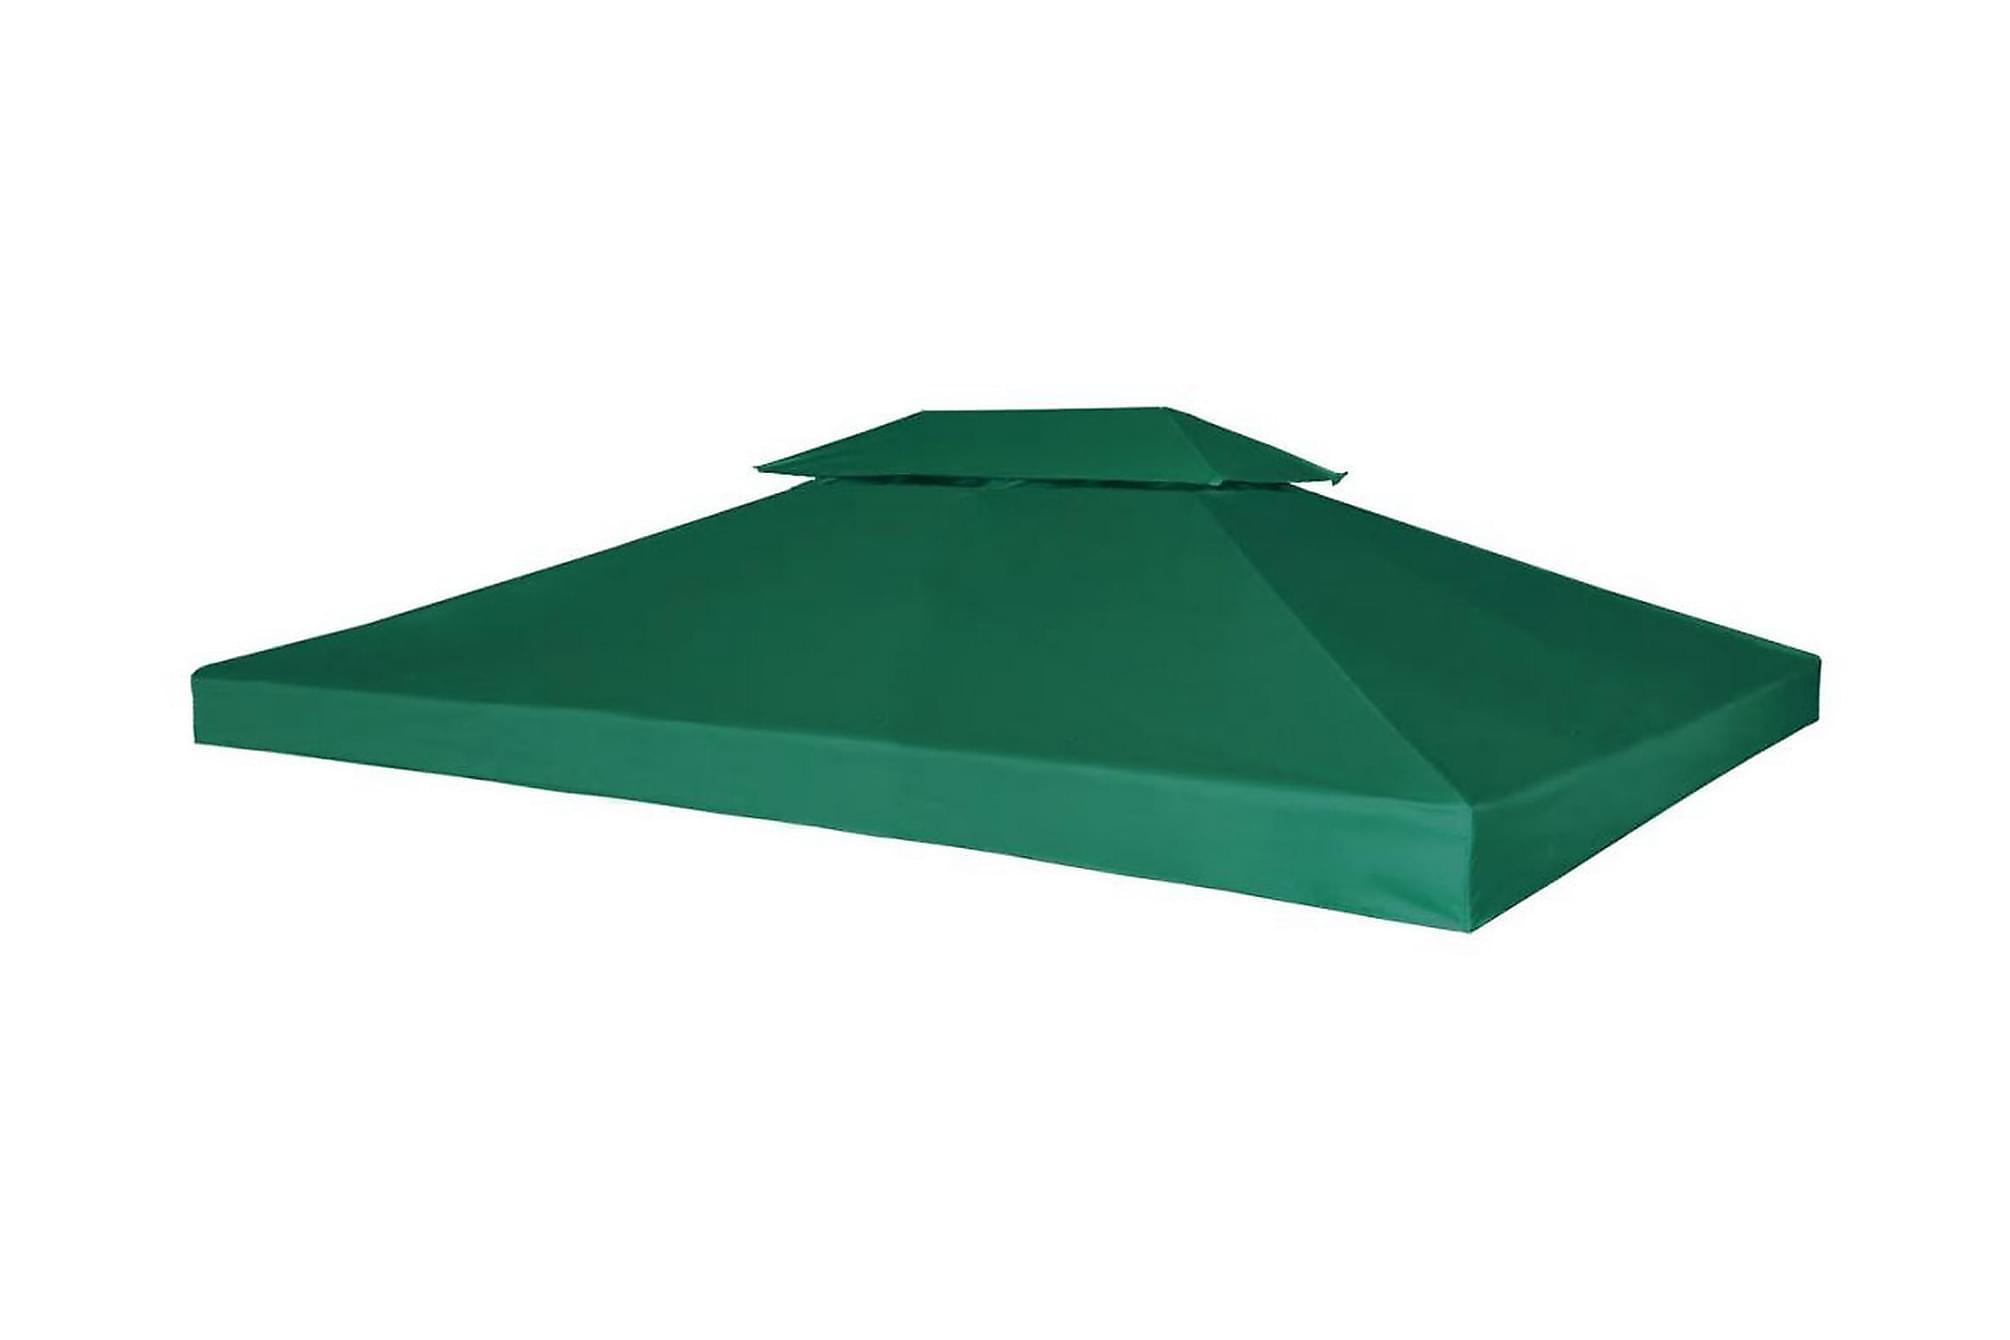 Paviljongtak 310 g/m2 3 x 4 m grön